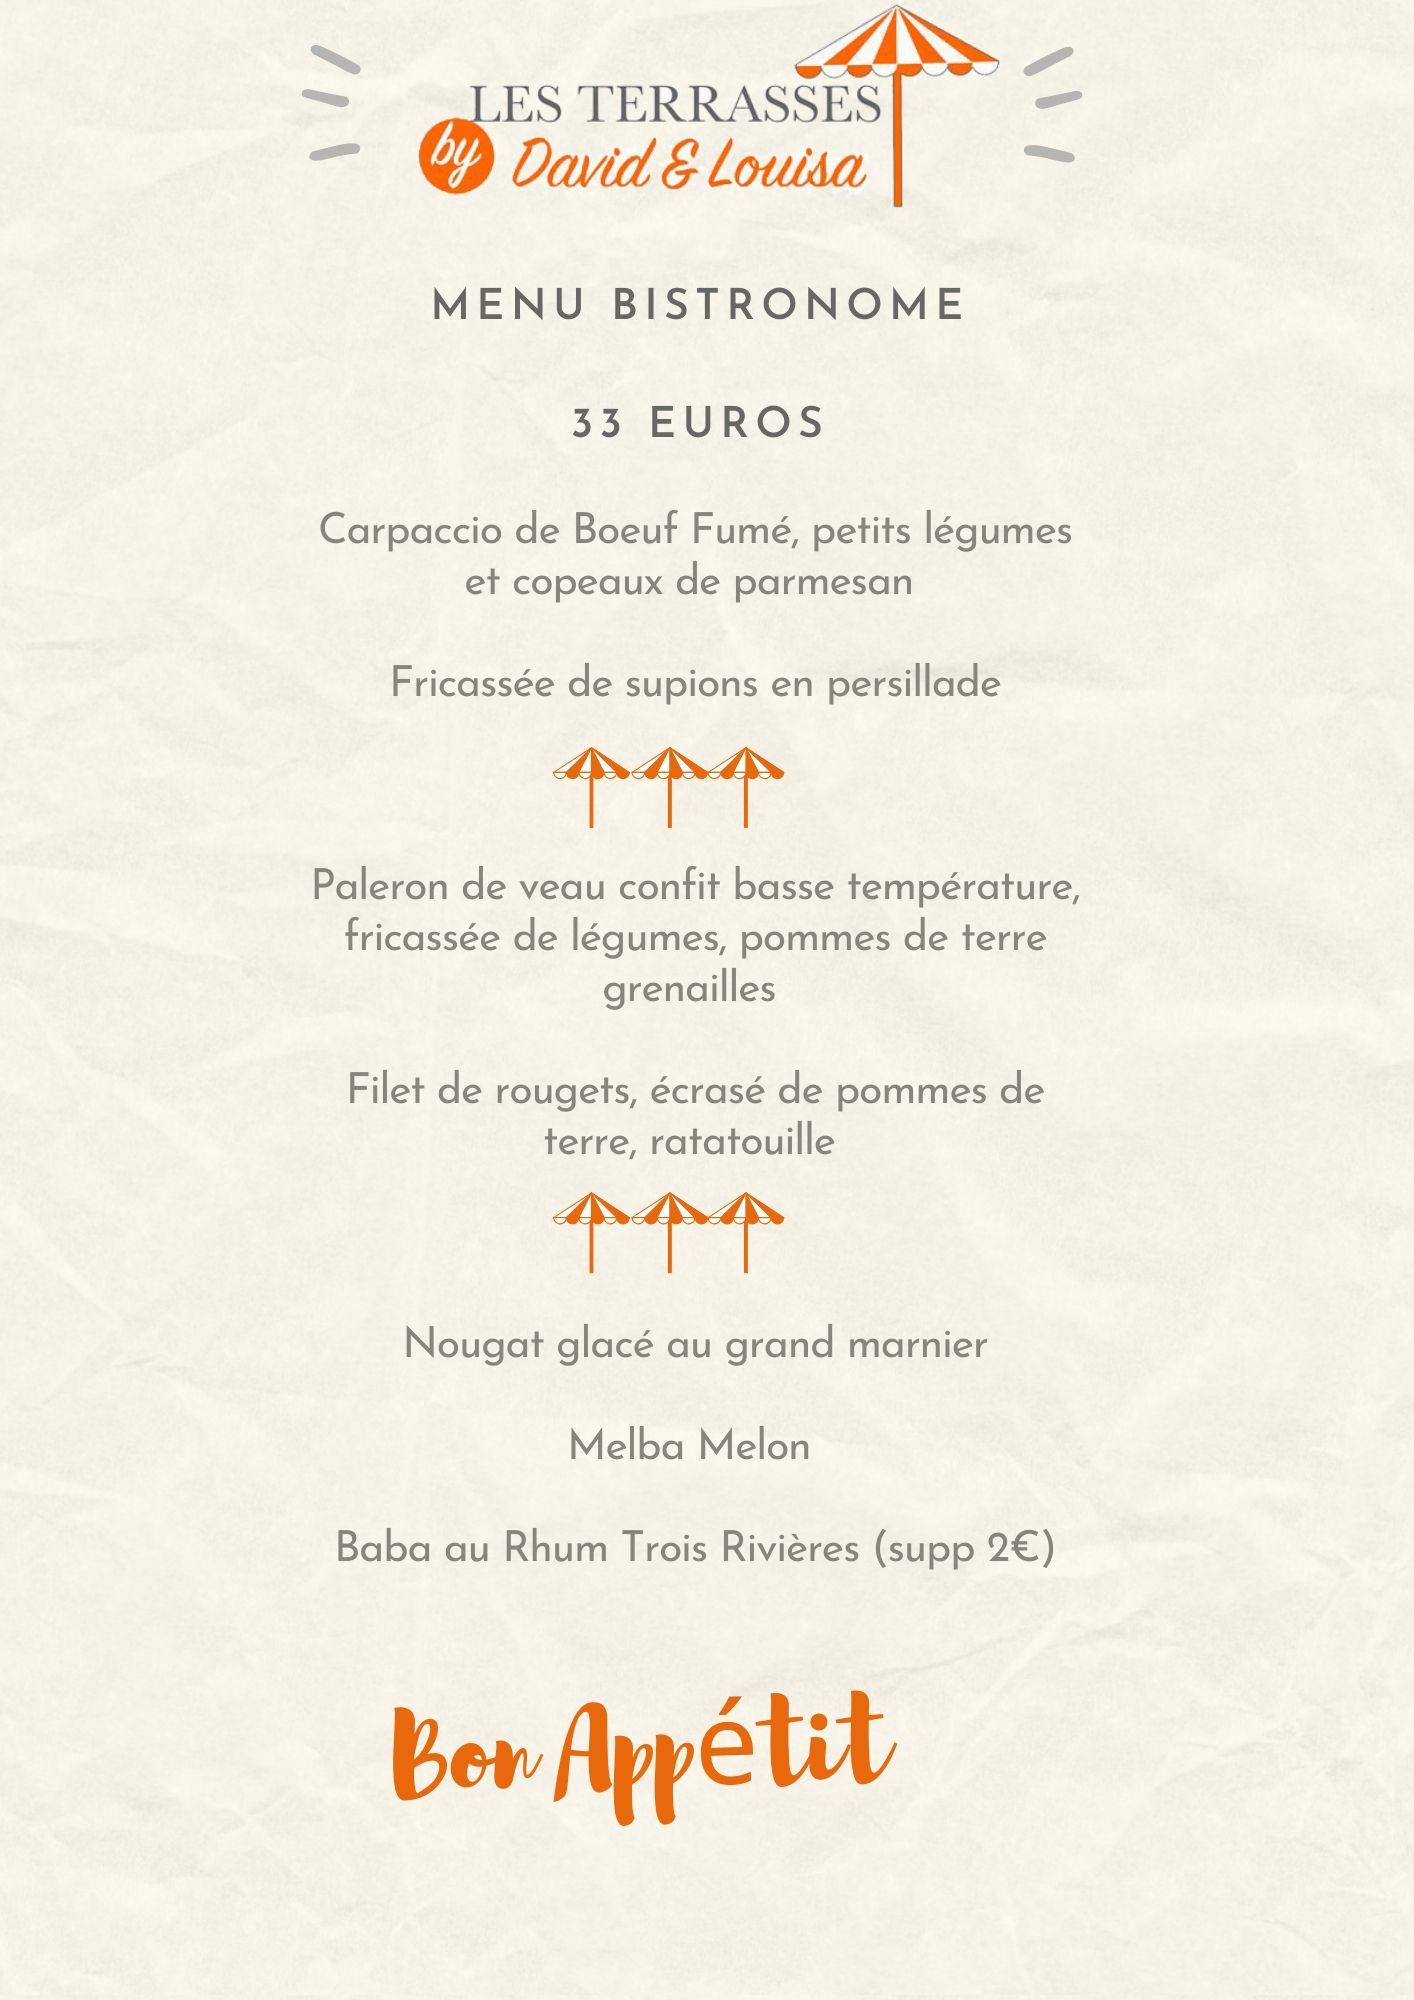 menu à emporter du restaurant les terrasses